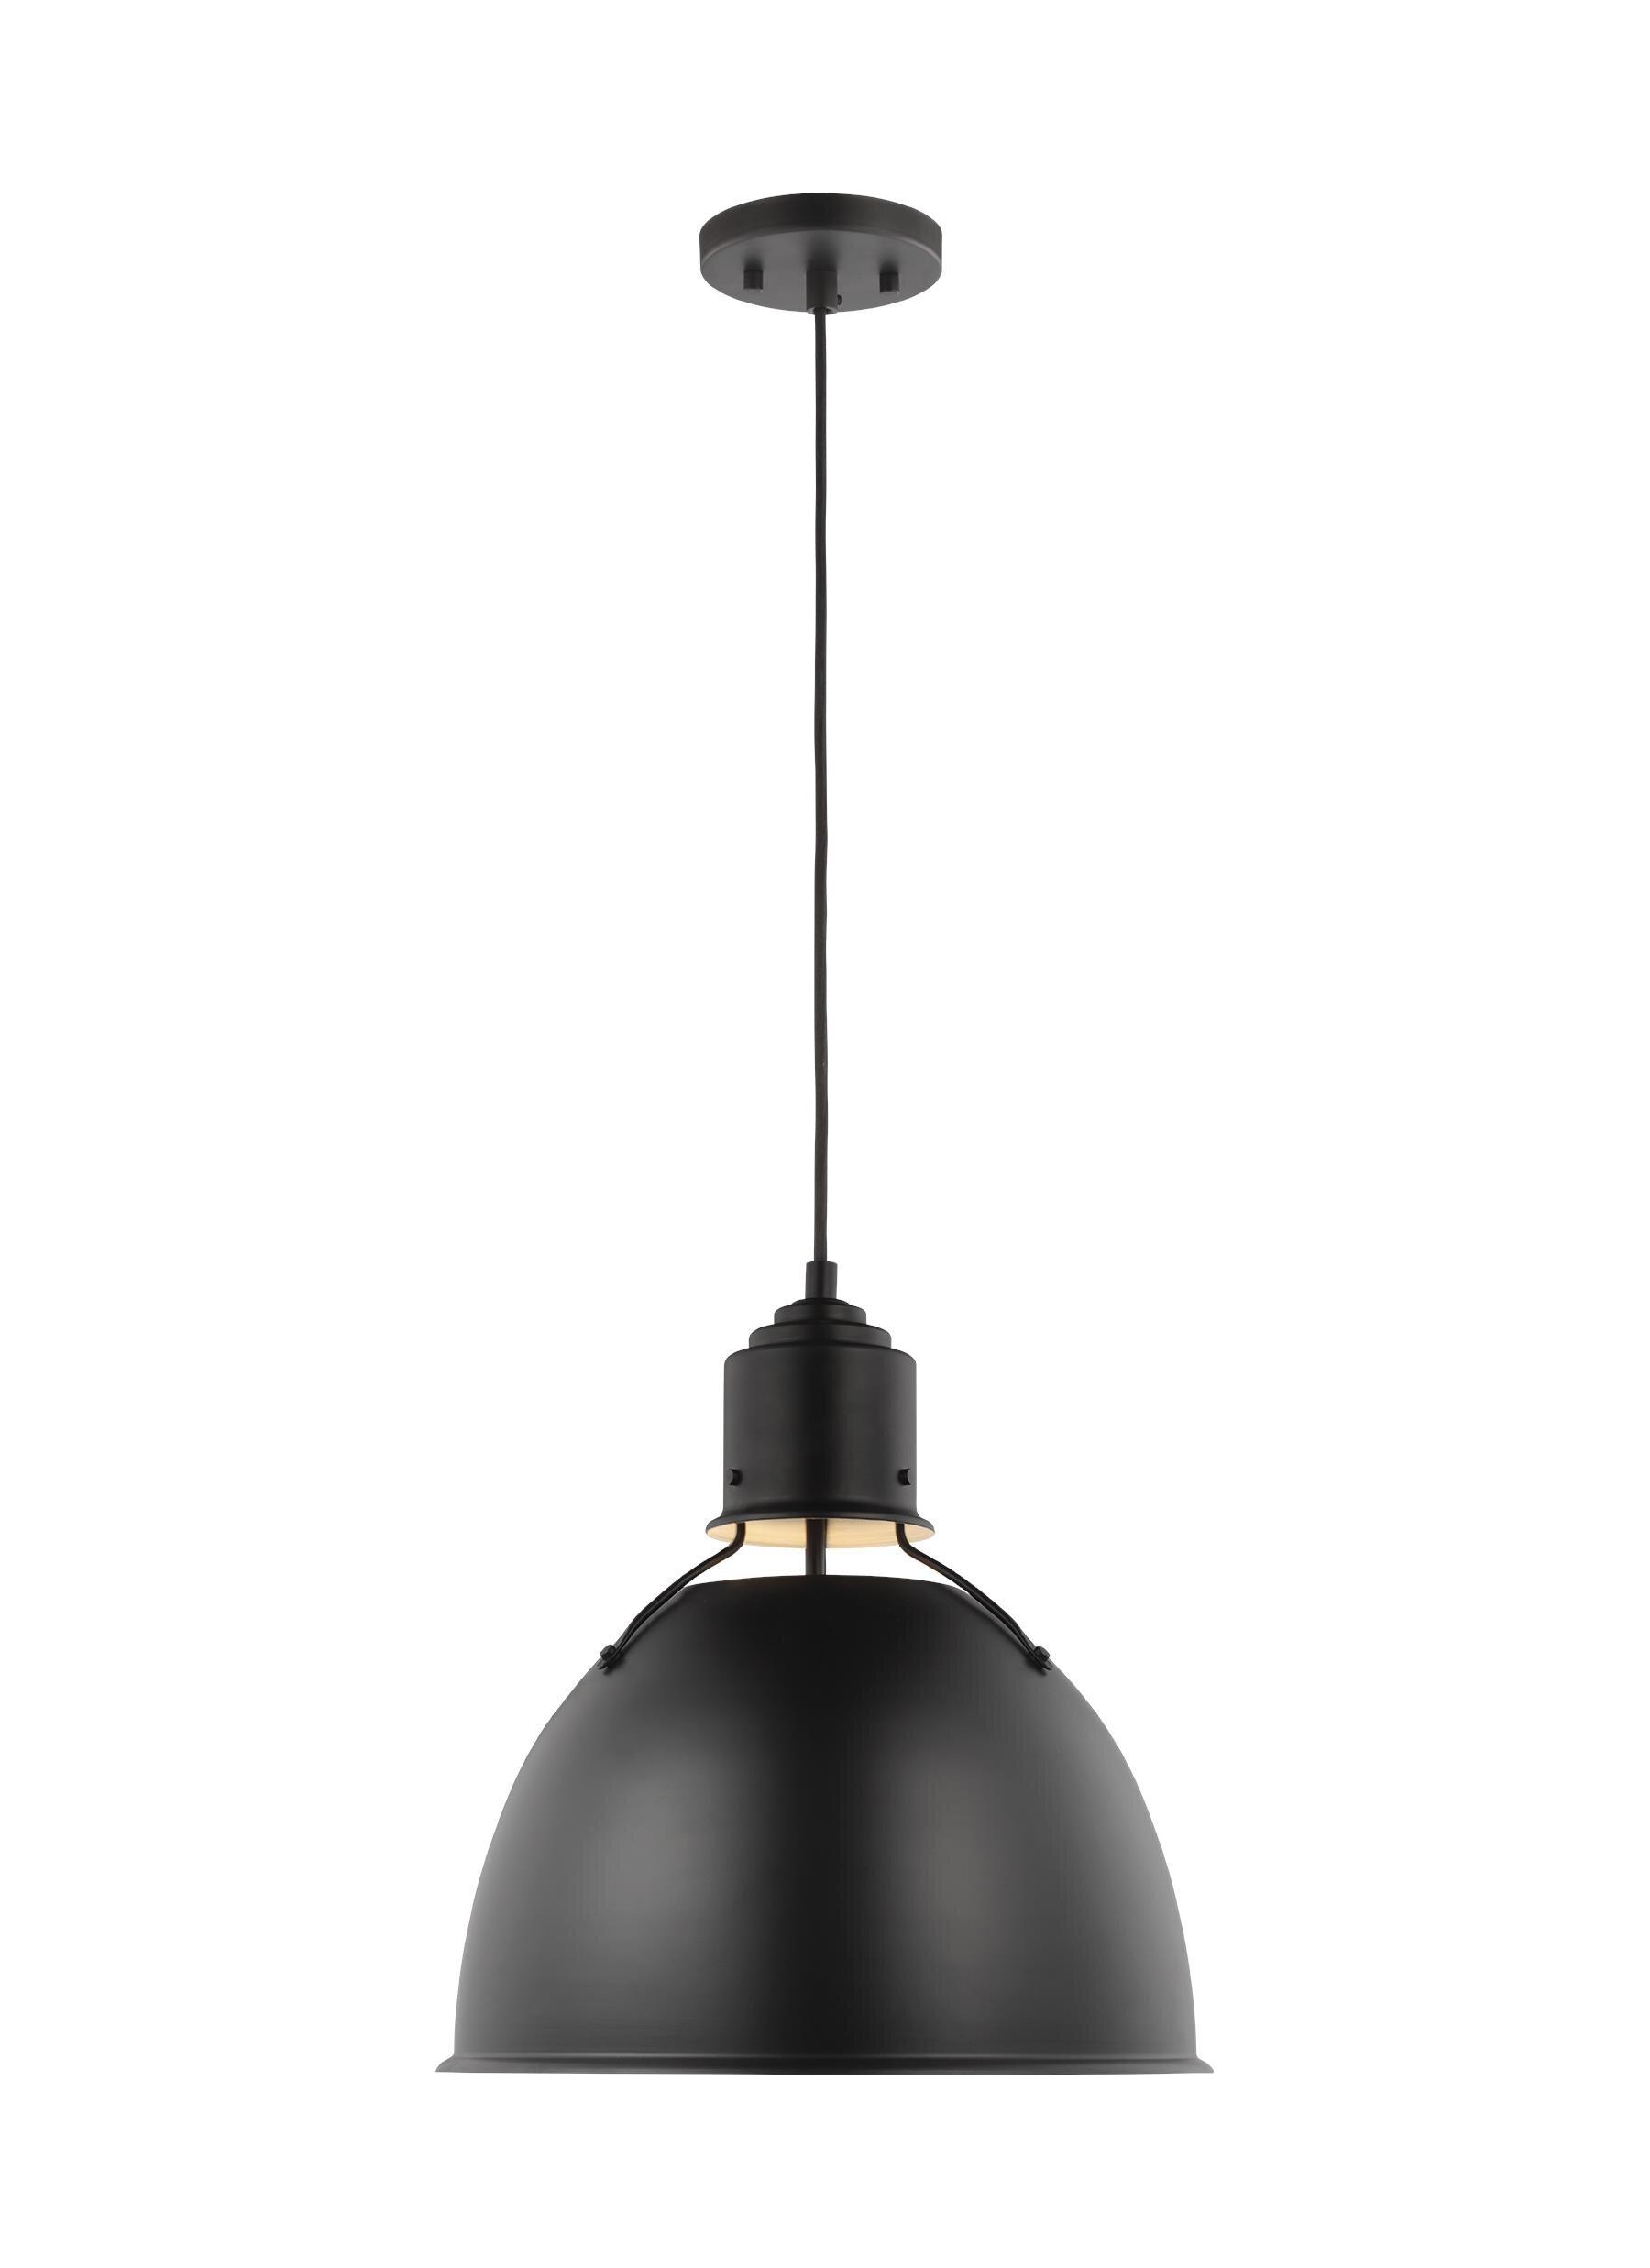 1 Light Dome Pendant Lighting You Ll Love In 2021 Wayfair